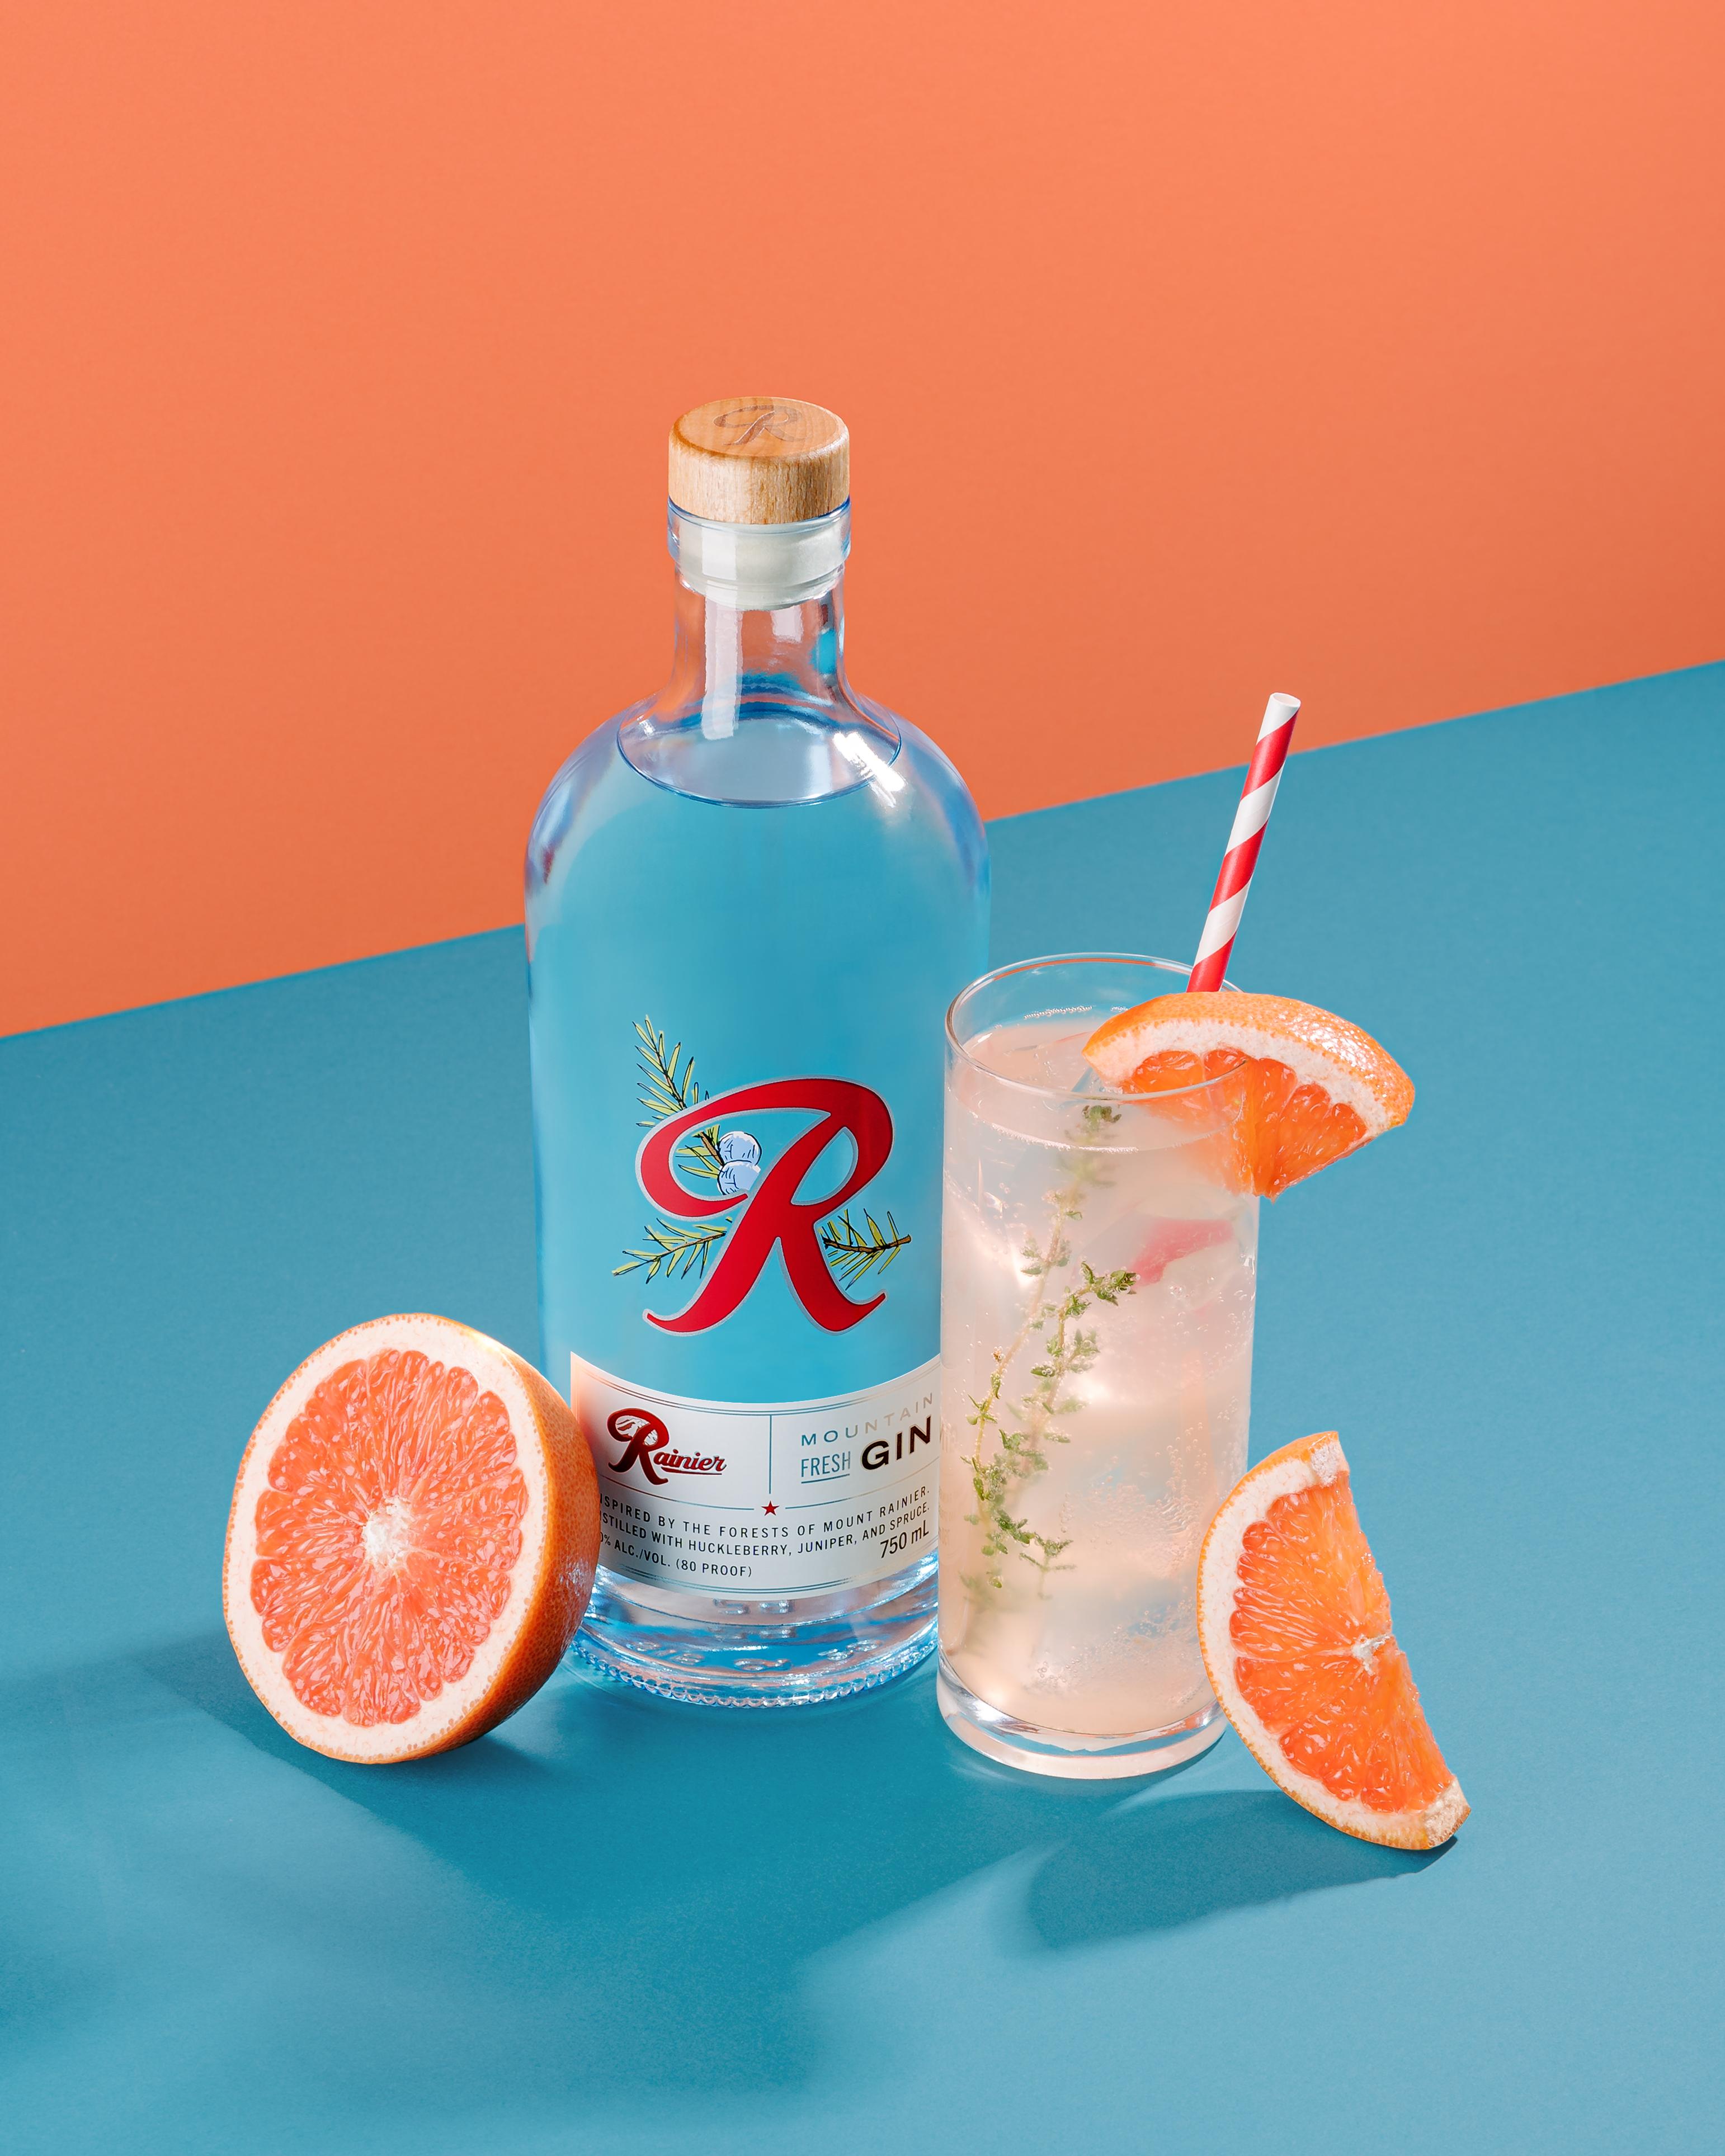 image of Rainier Mountain Fresh Gin Spritz courtesy of Rainier Beverage Company